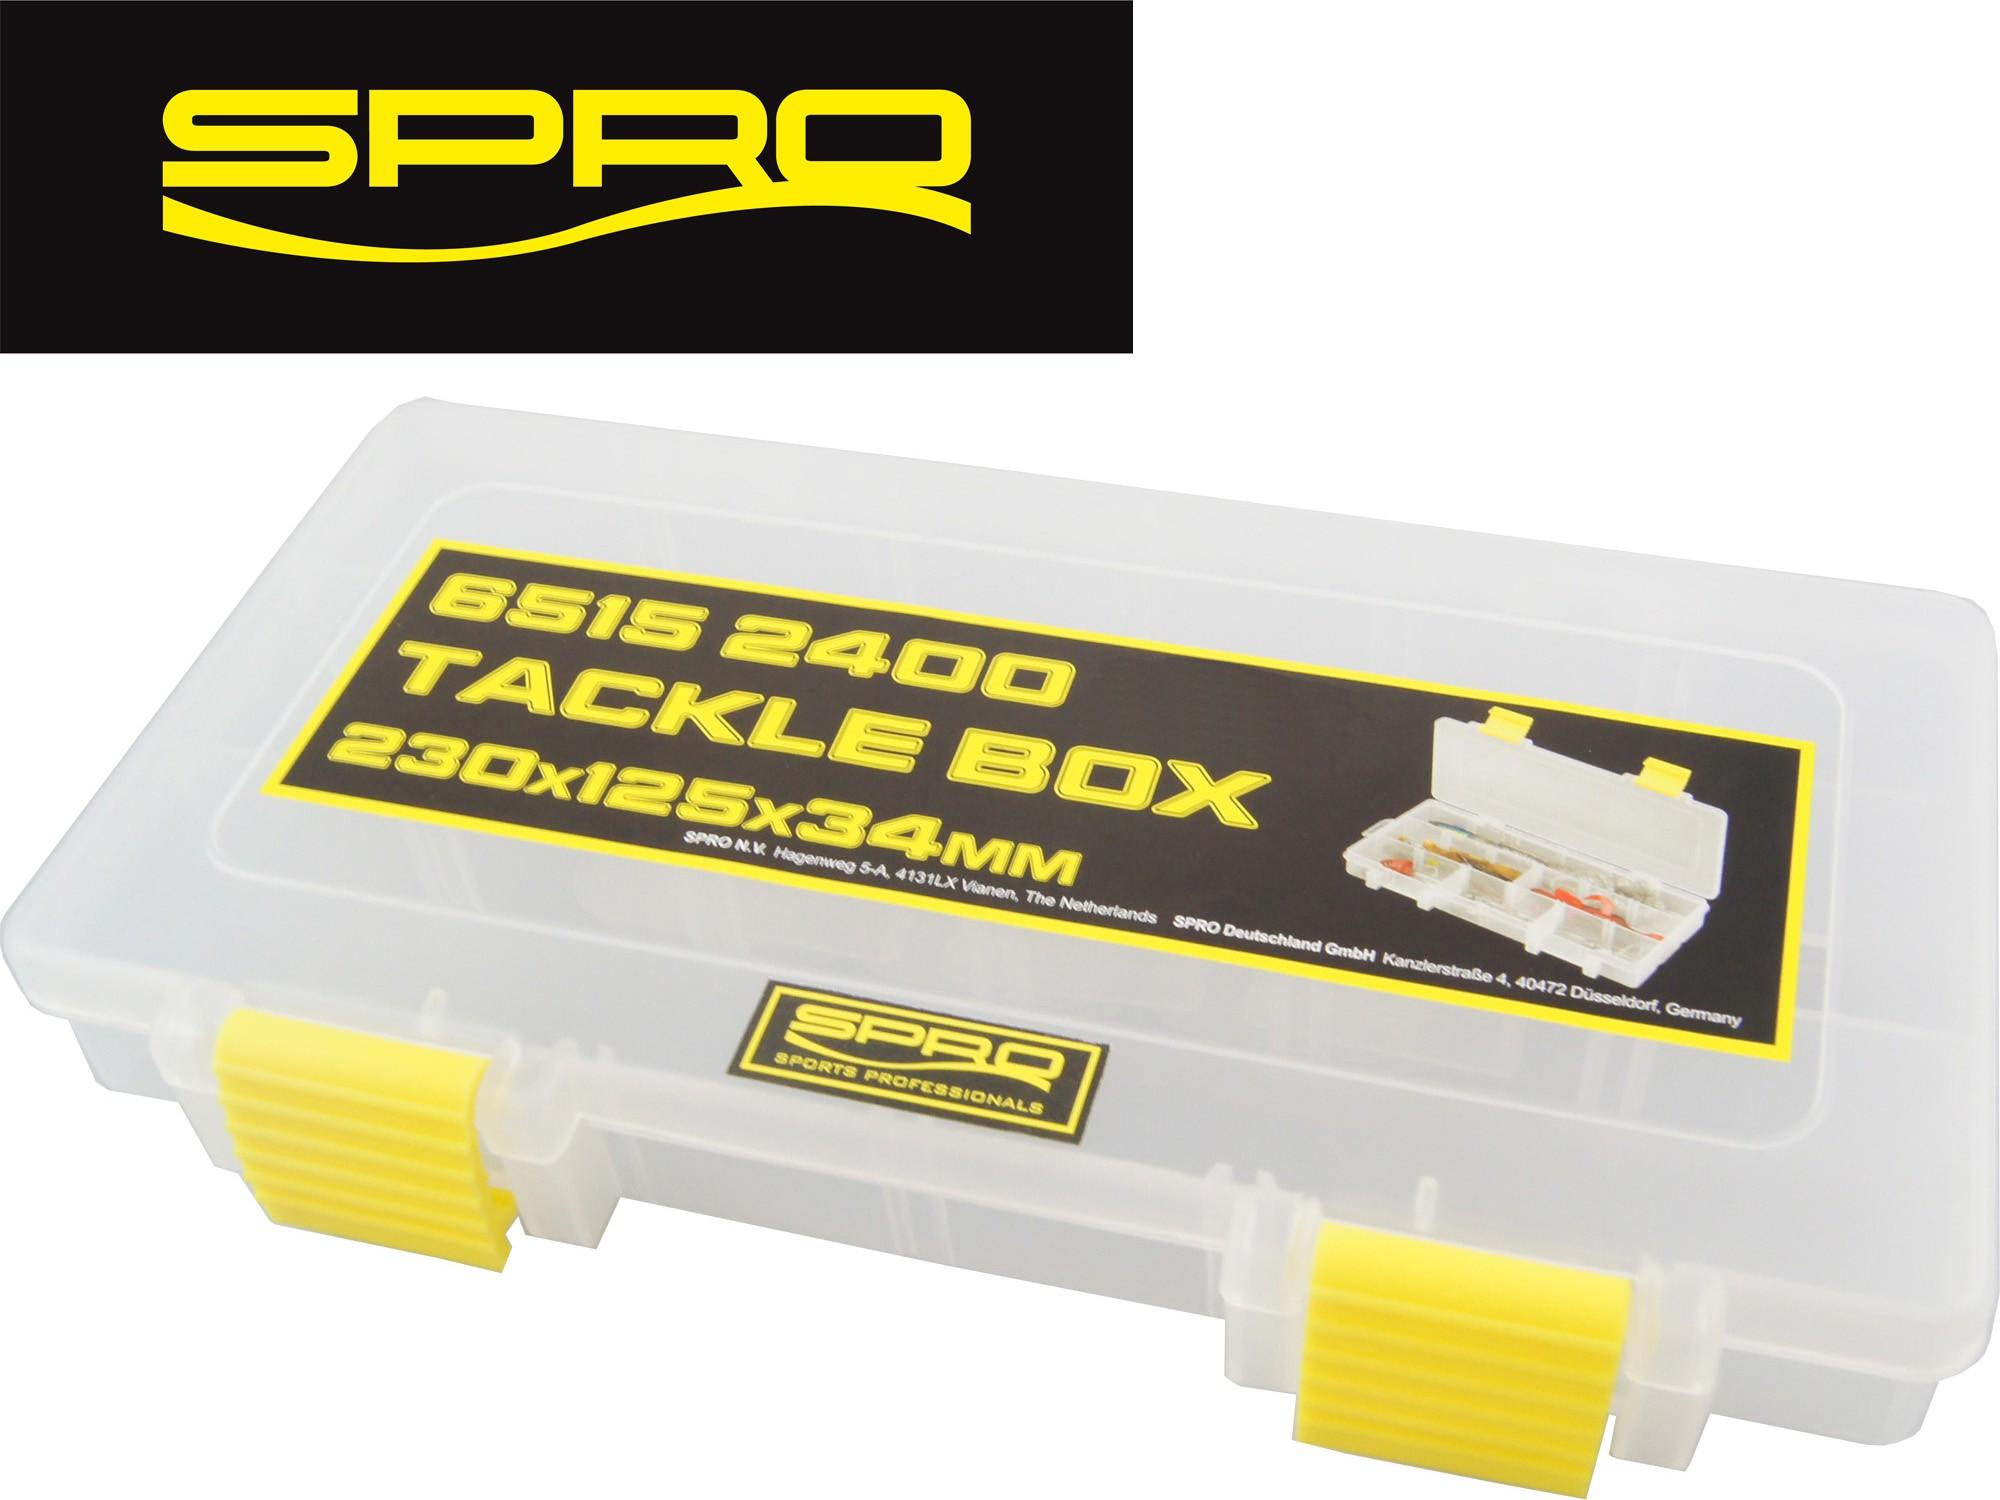 Kunstköderbox Tacklebox Köderbox Spro Tackle Box 23x12,5x3,4cm Angelbox